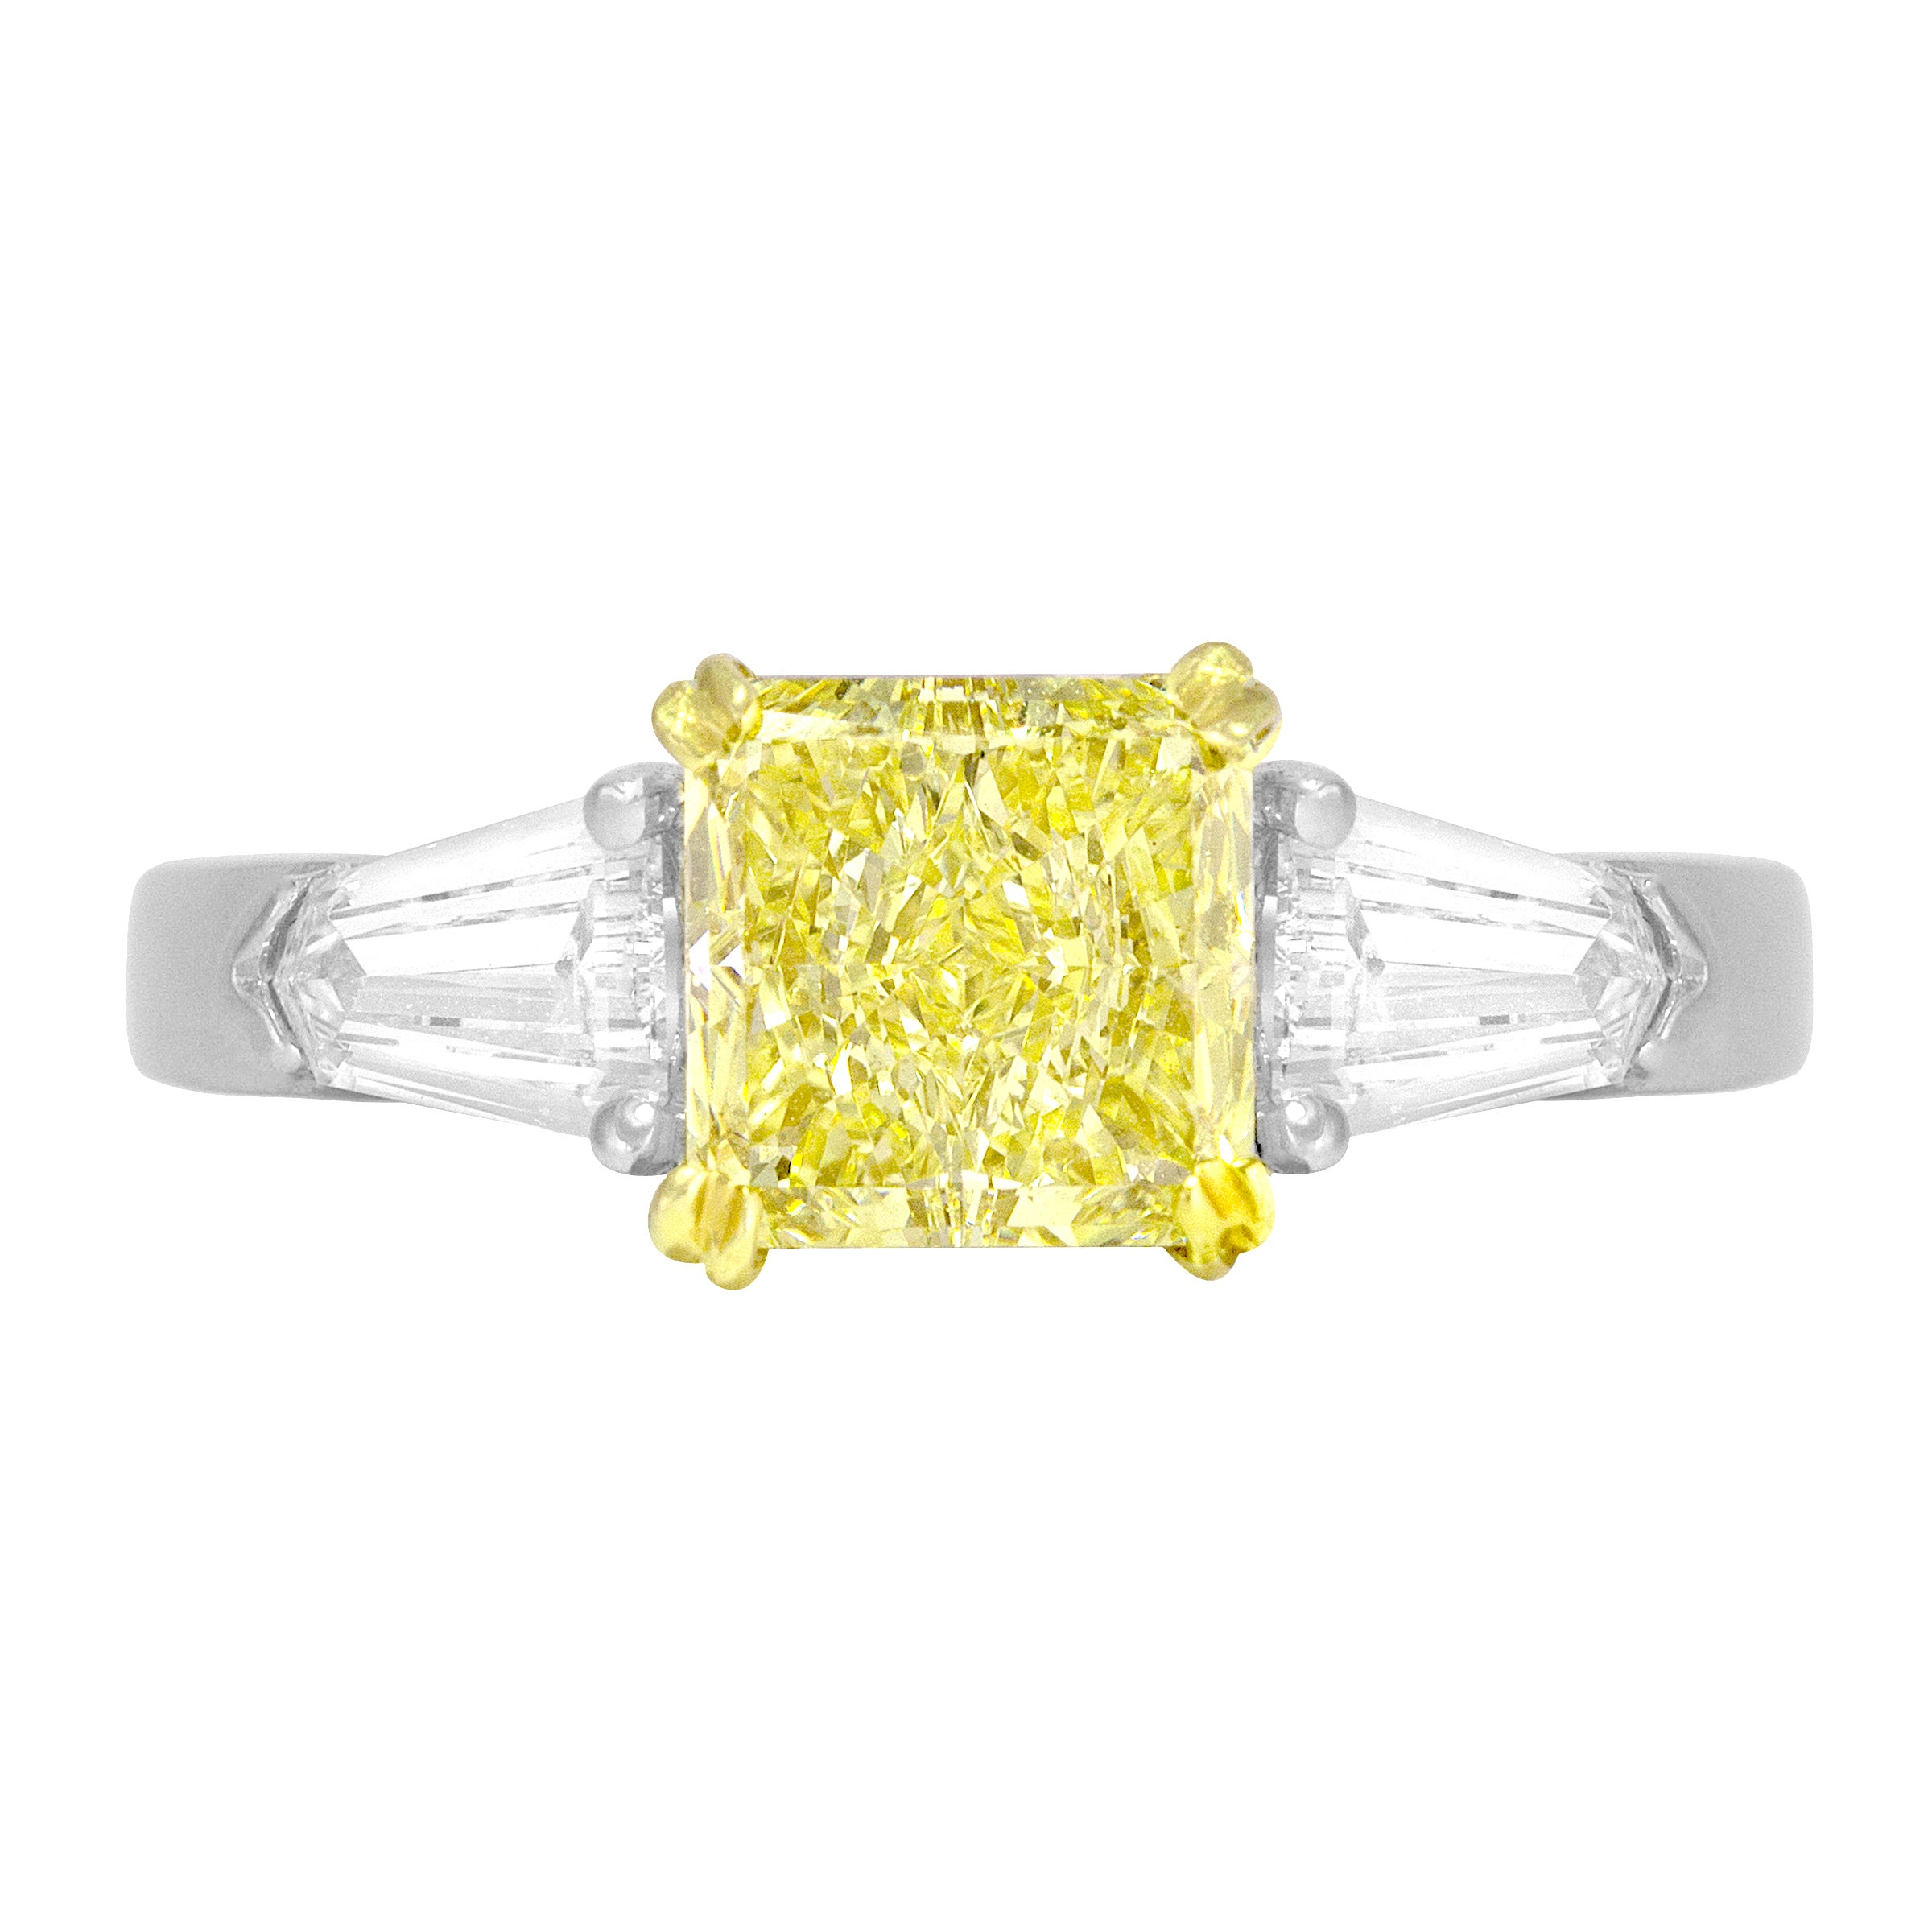 DiamondTown GIA Certified 1.08 Carat Fancy Light Yellow Diamond 3-Stone Ring